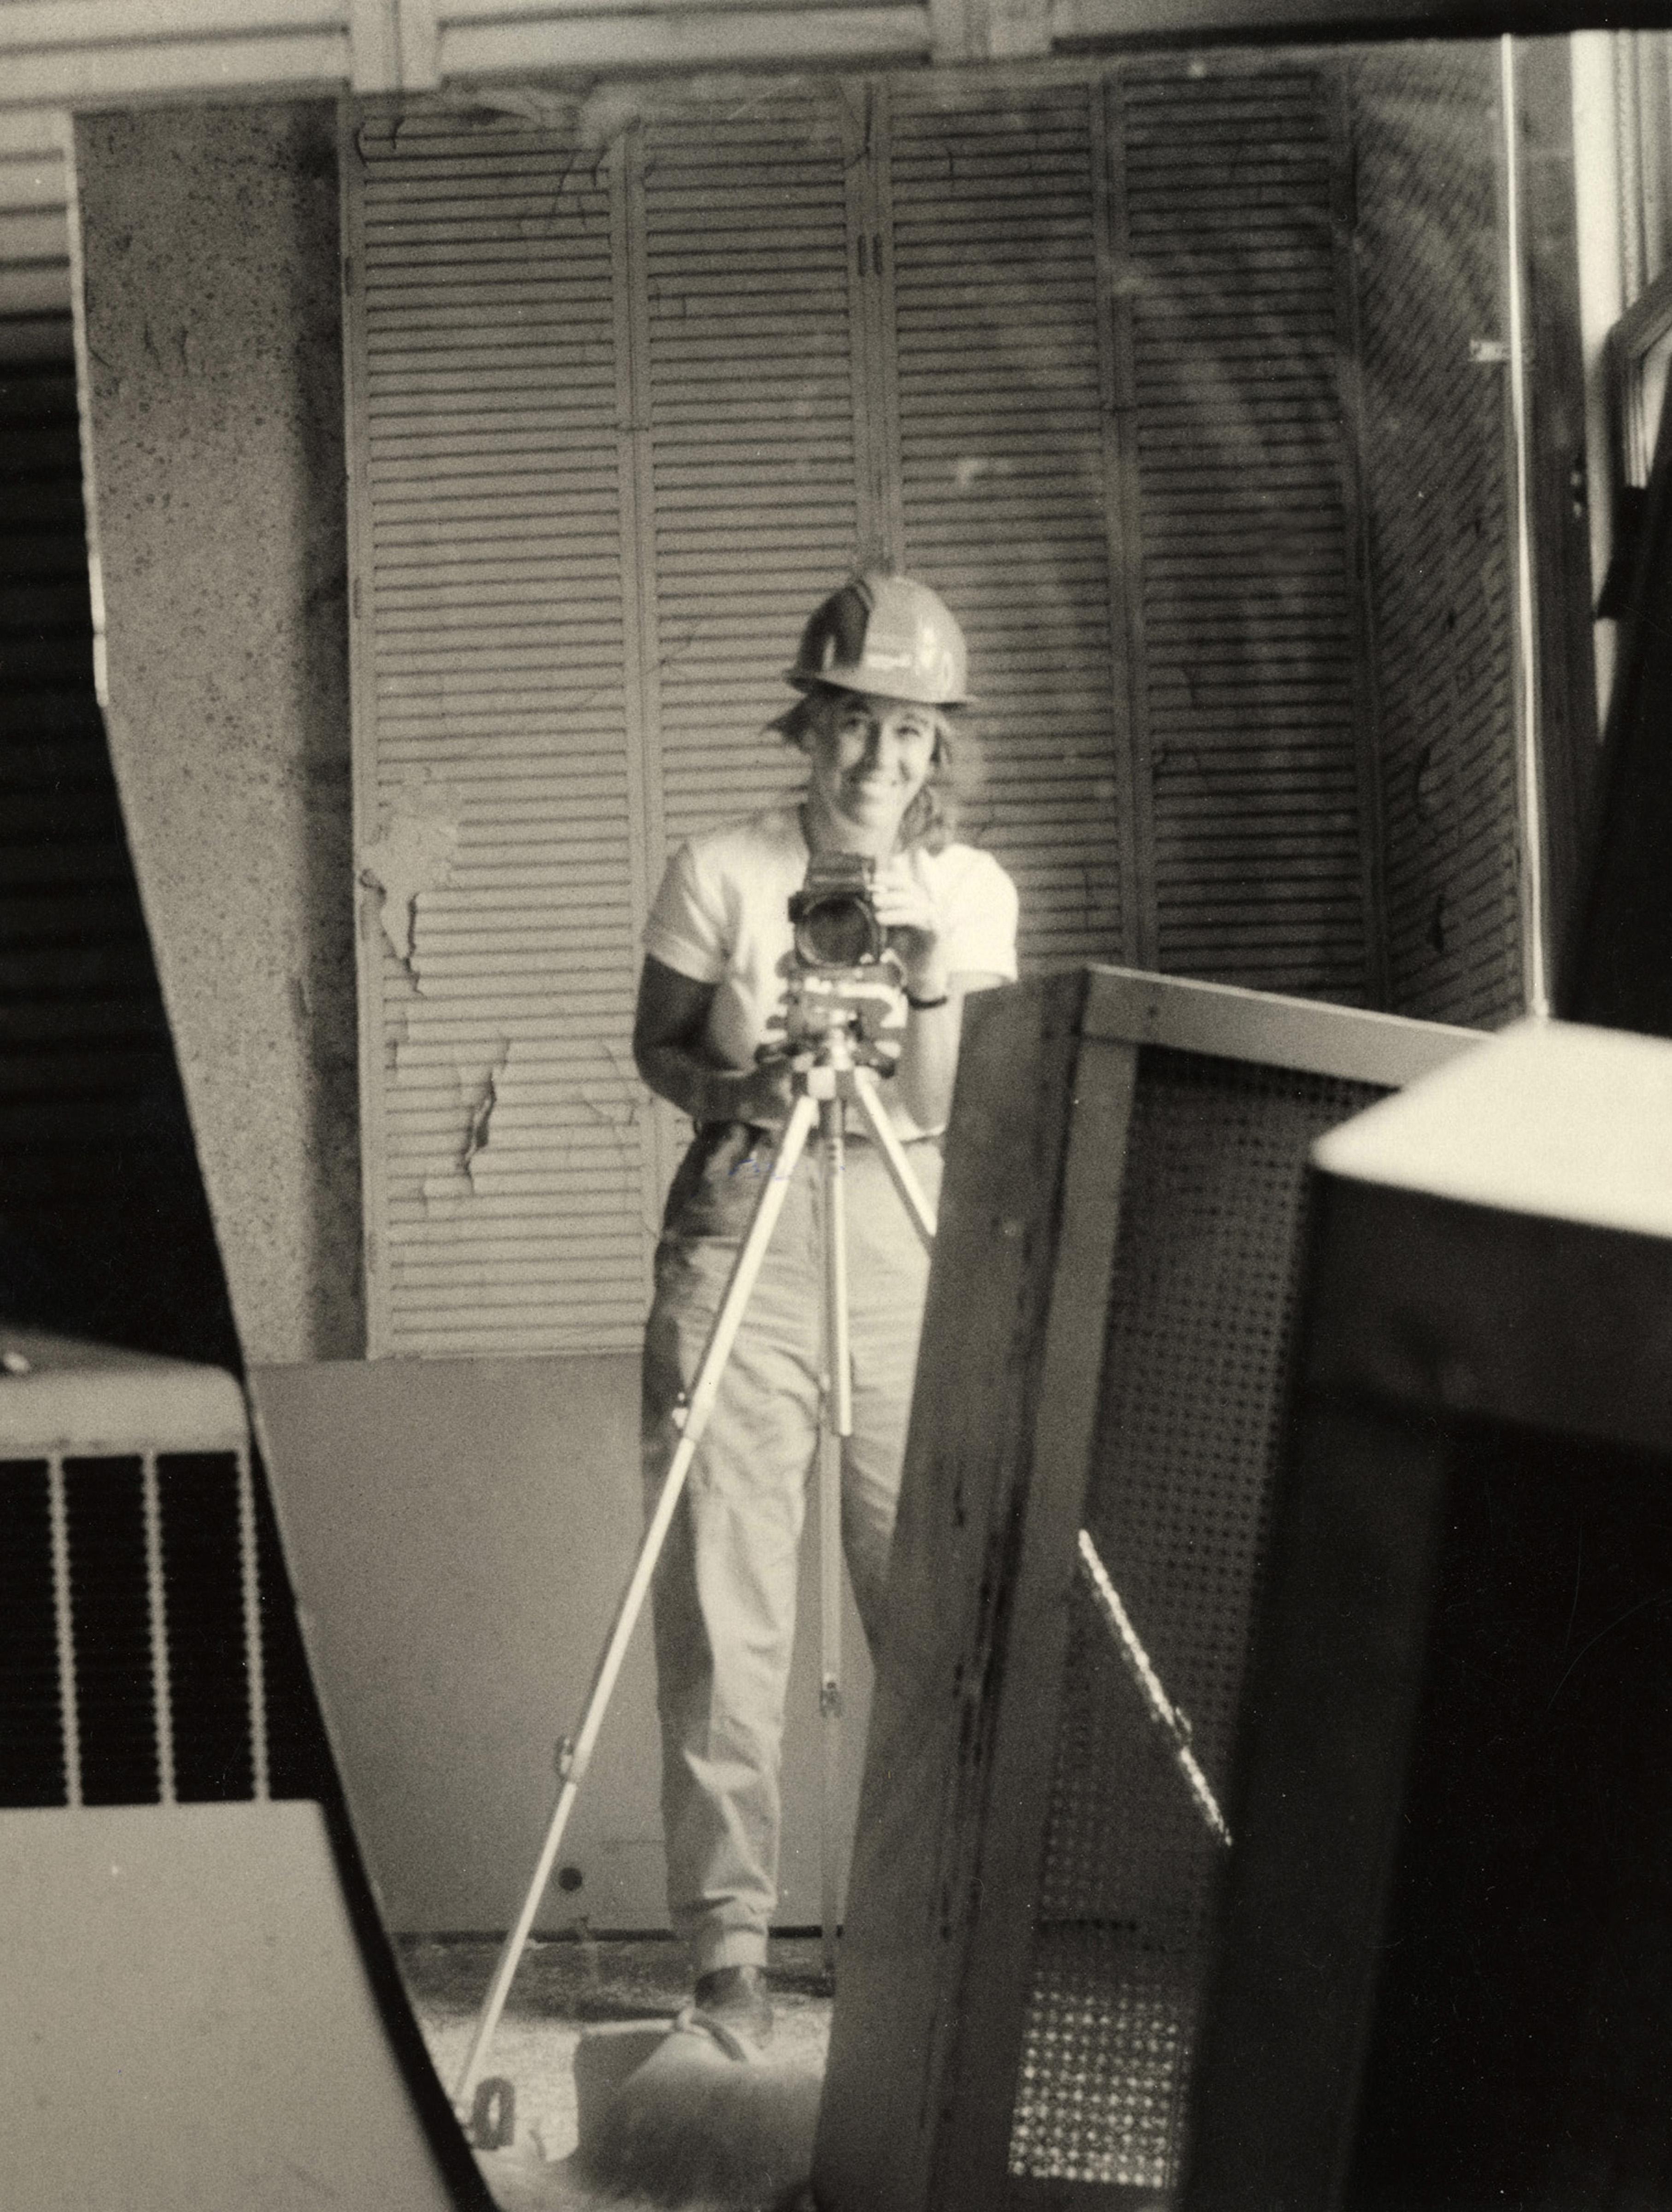 Image of Carol M. Highsmith from Wikidata